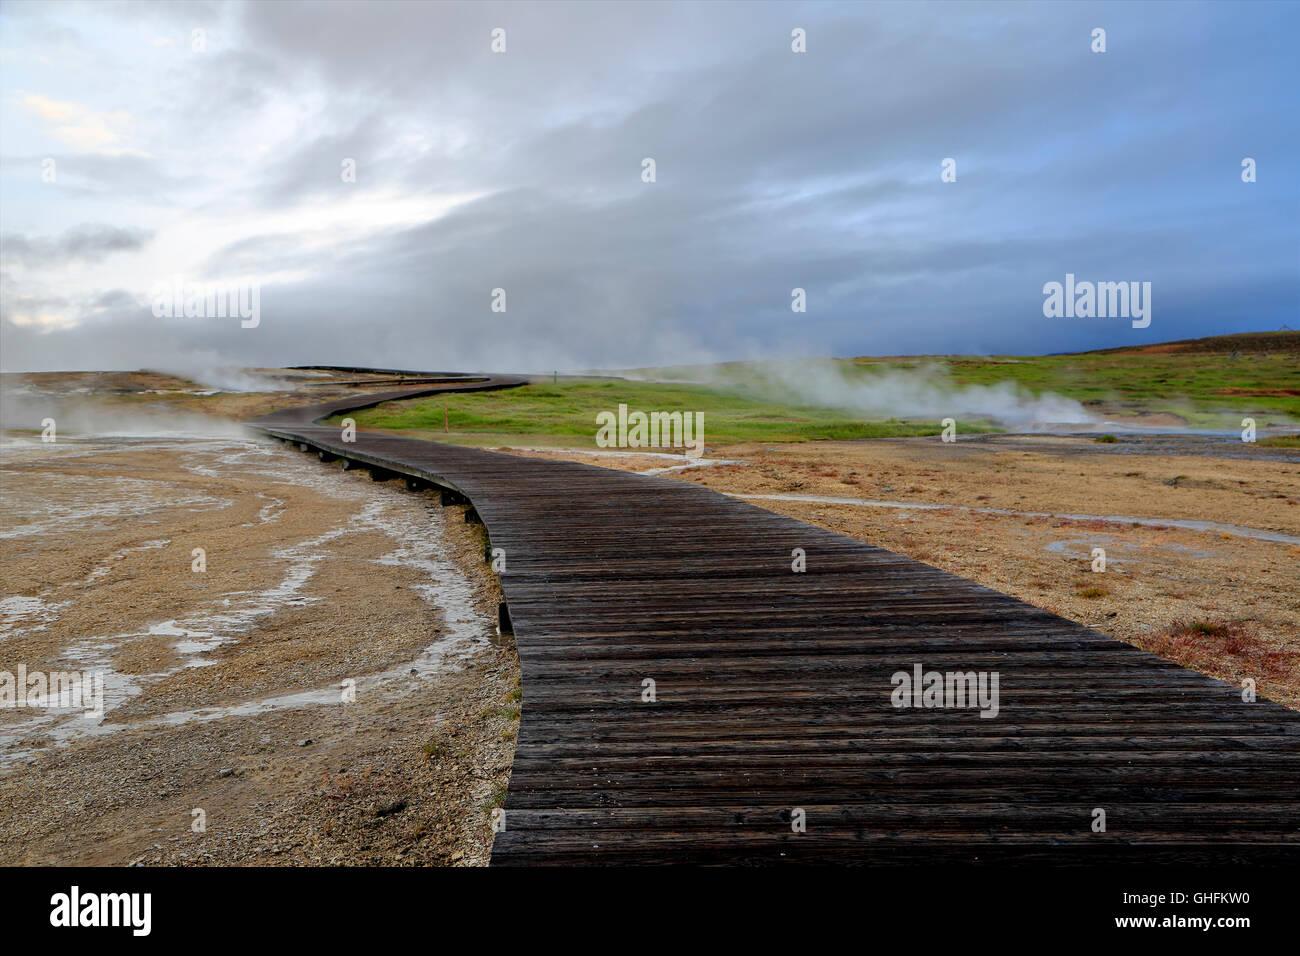 Boardwalk and fumaroles, Hveravellir, Iceland - Stock Image